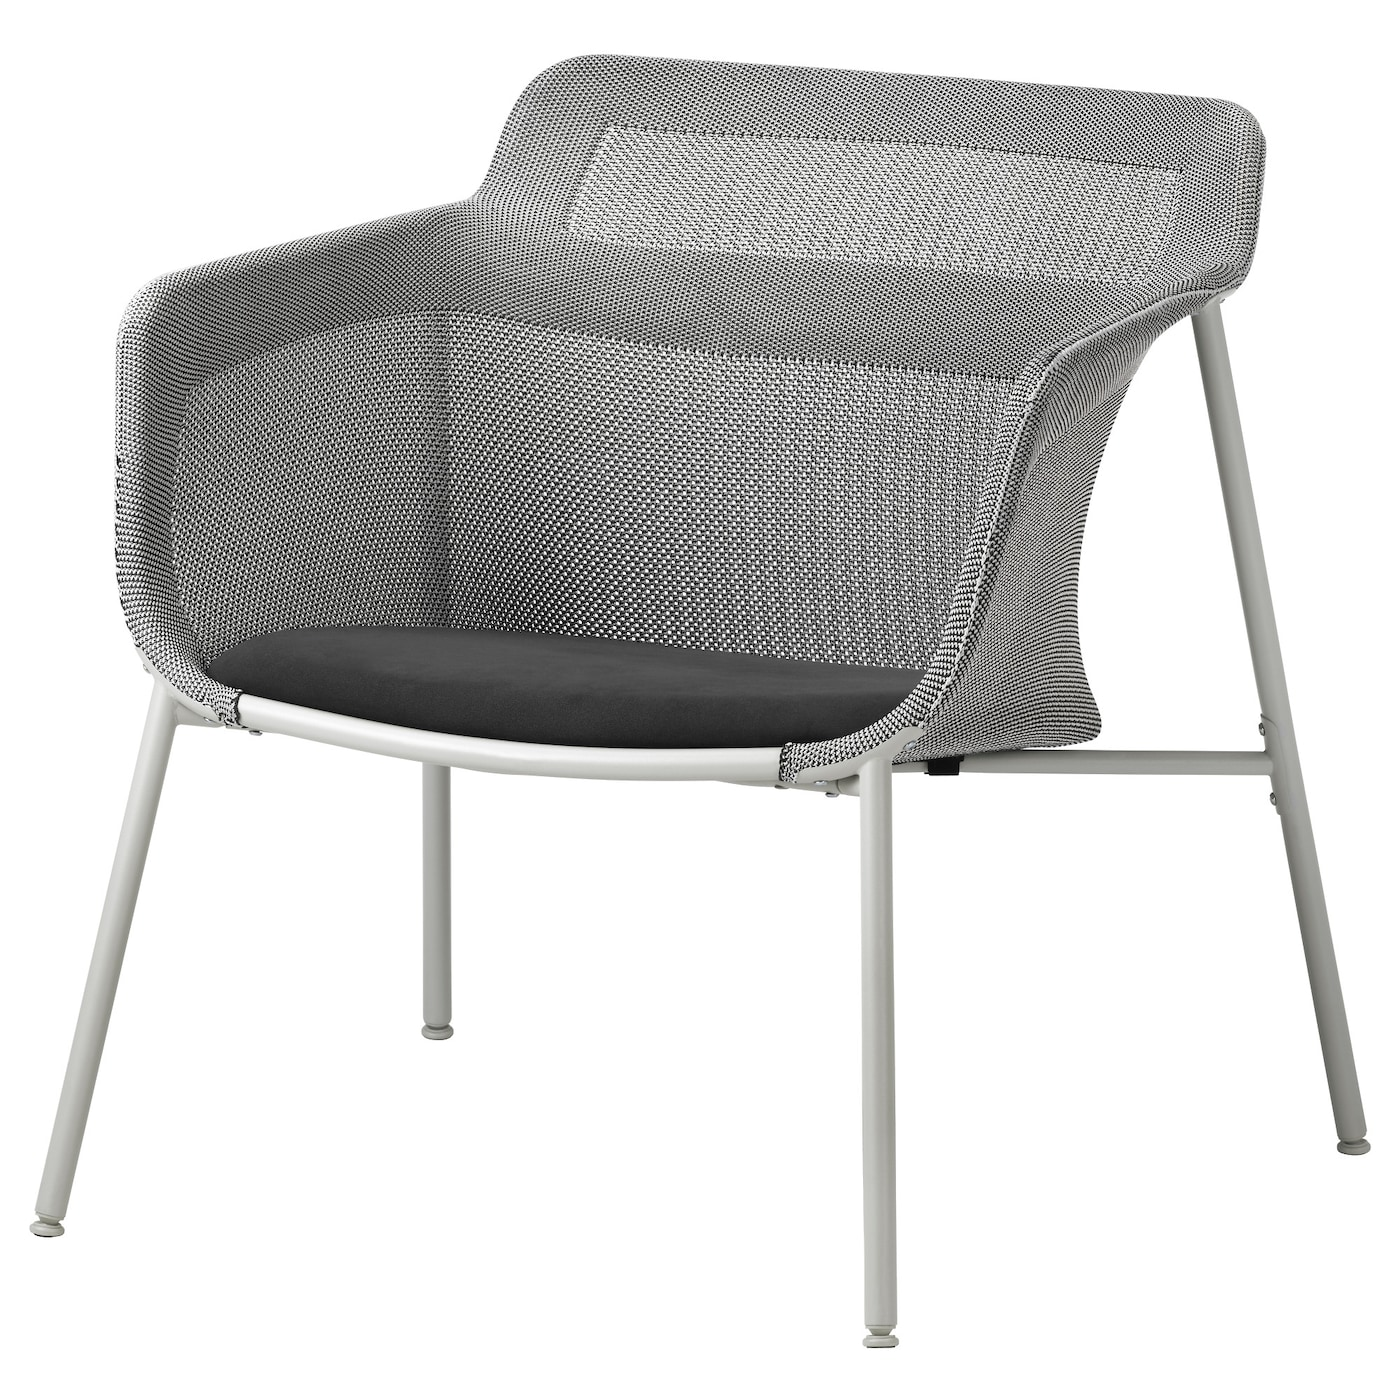 IKEA PS 2017, Sessel, grau 803.629.45